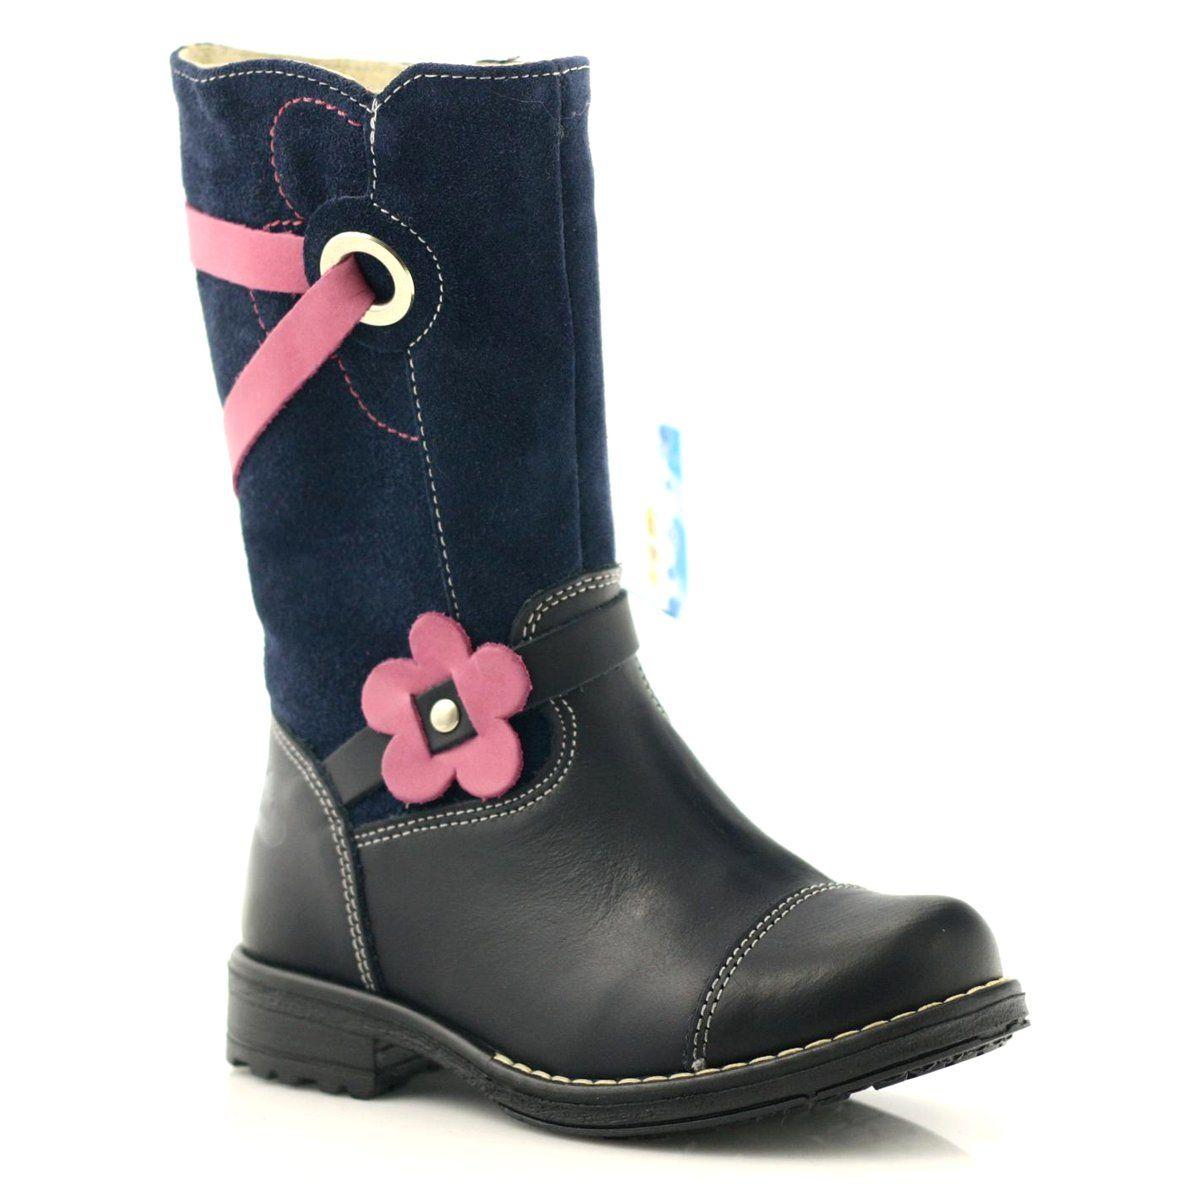 Kozaczki Buty Dzieciece Zimowe Ren But 3172 Granatowe Rozowe Boots Rubber Rain Boots Rain Boots